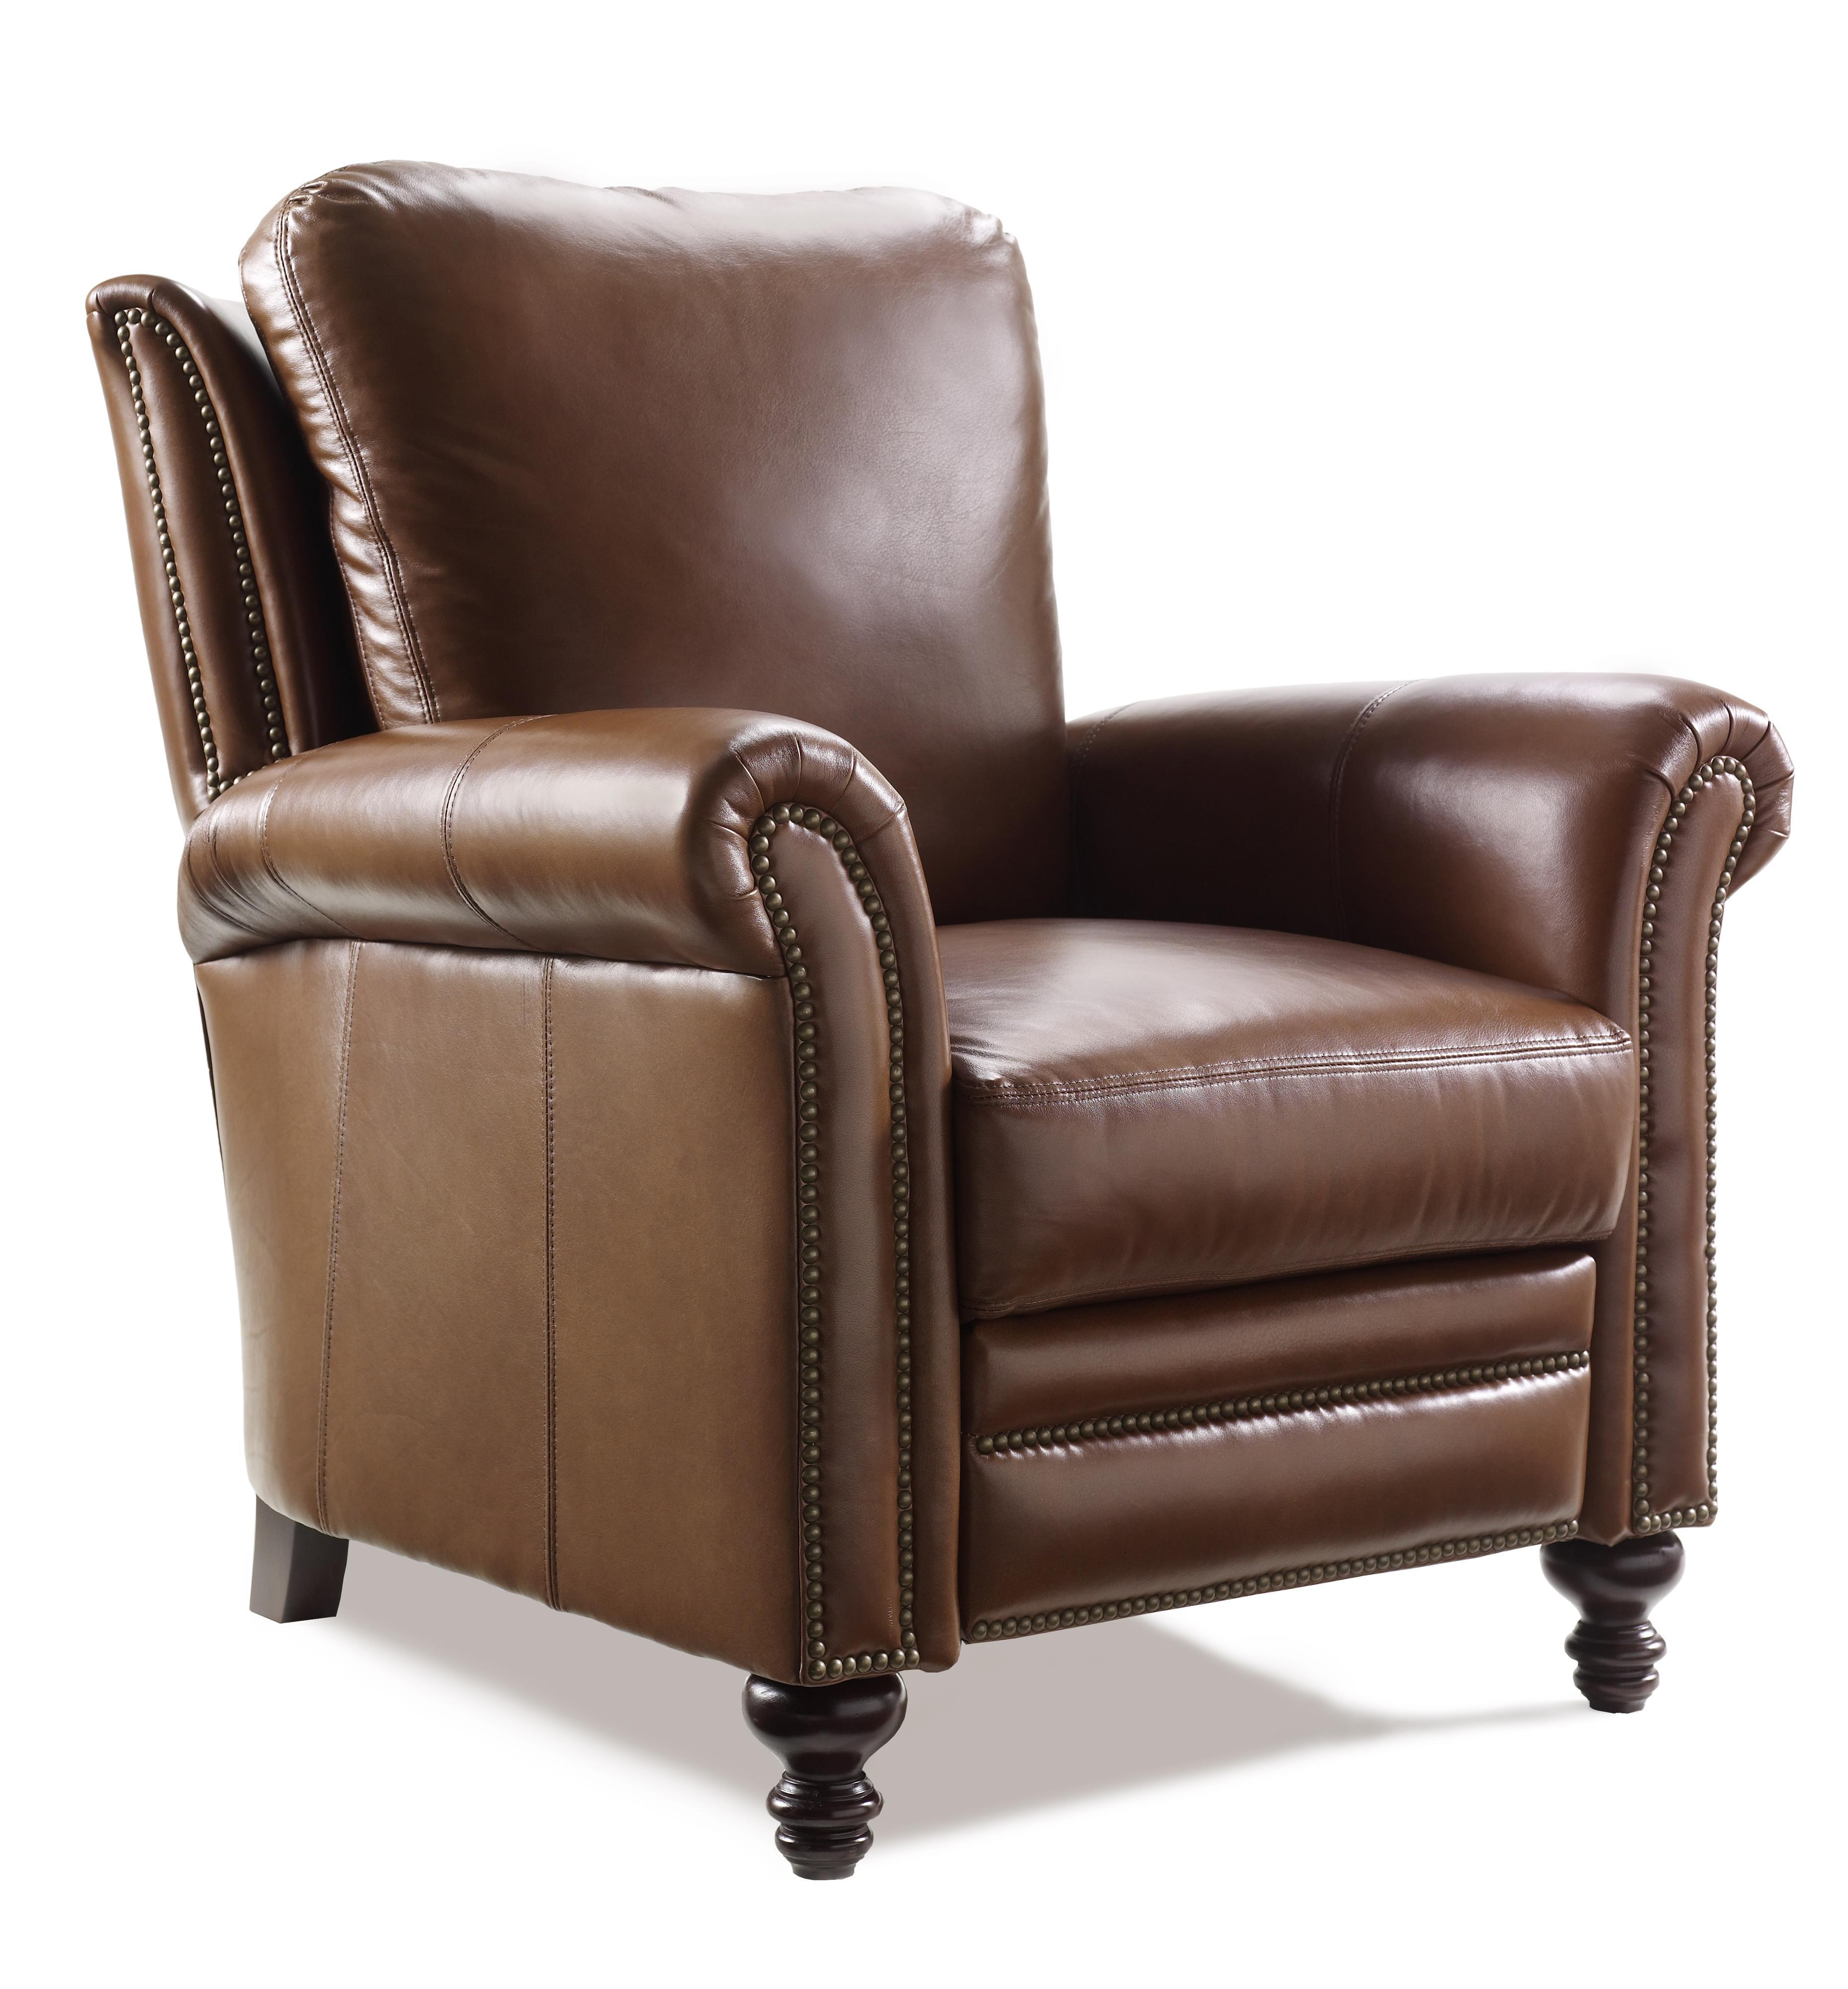 Richardson Richardson High Leg Lounger by Bradington Young at Baer's Furniture